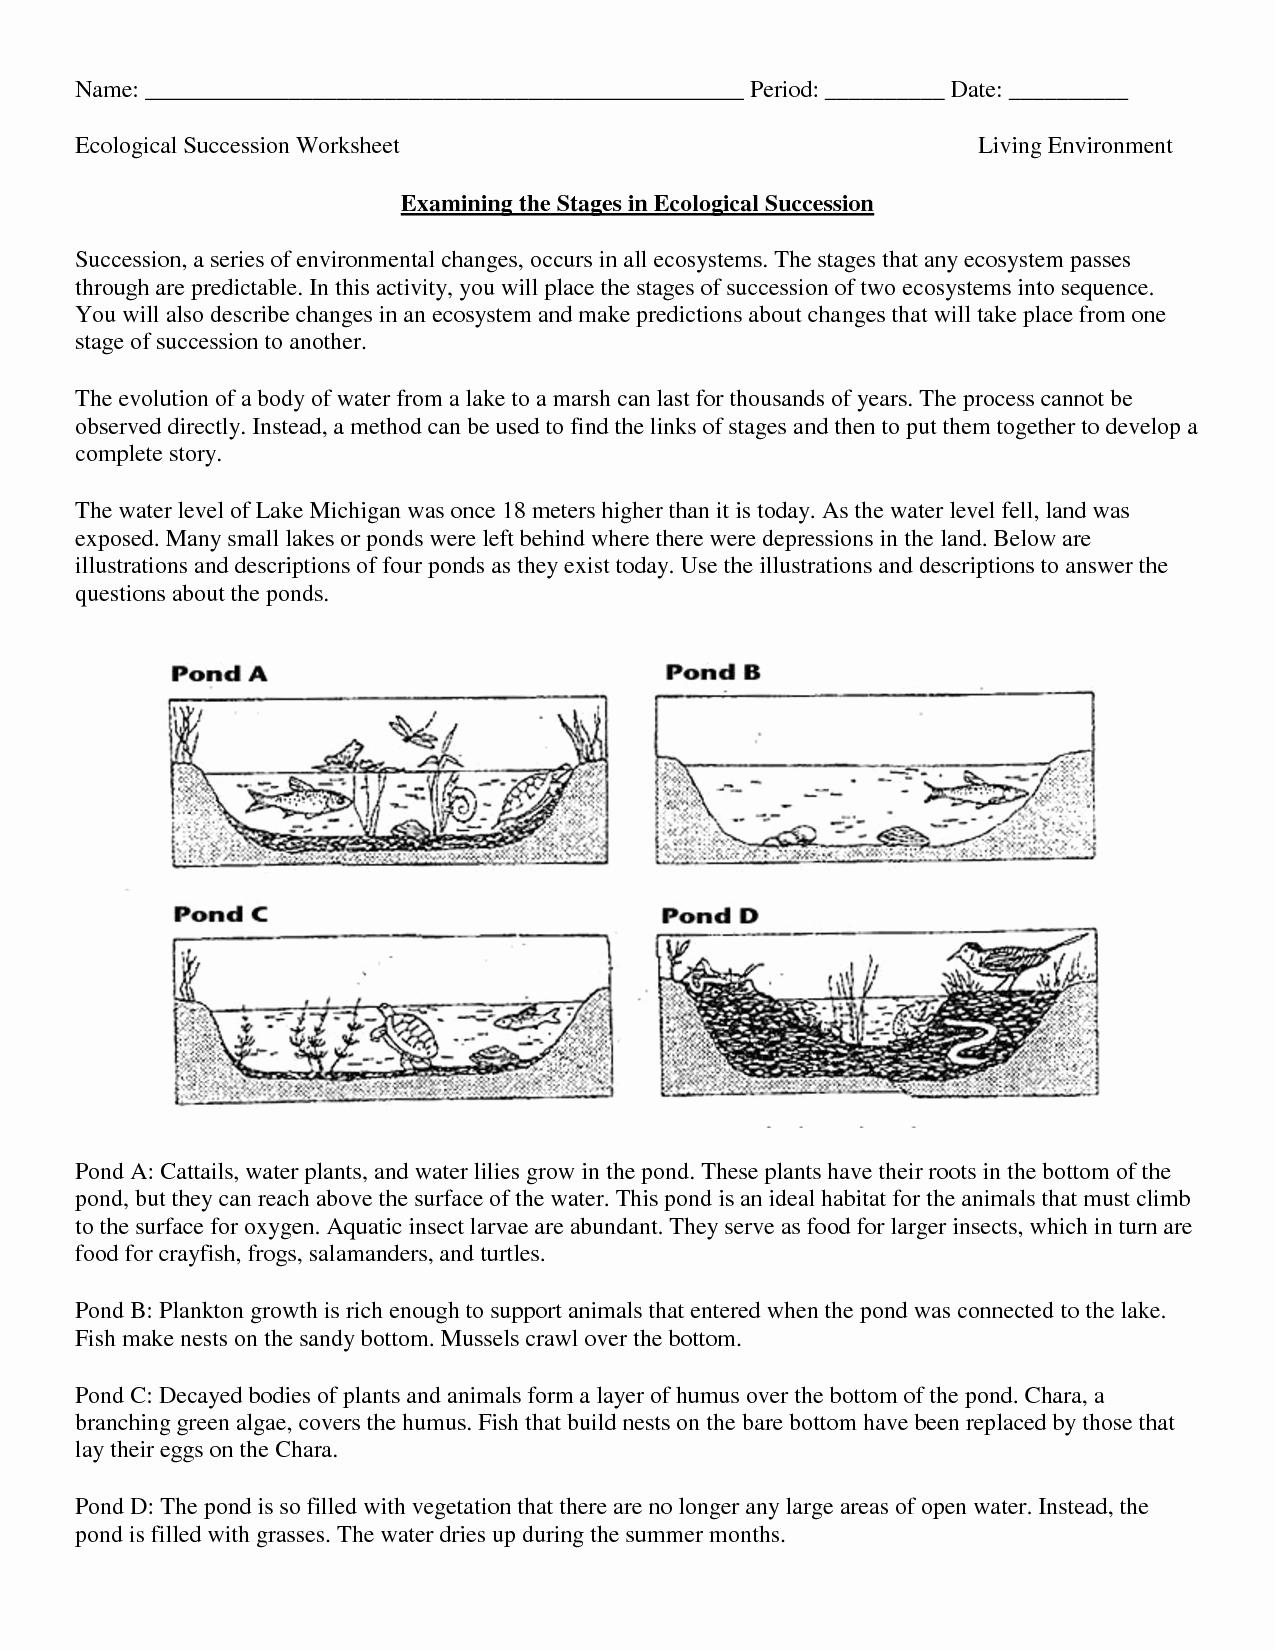 Free Printable Ecosystem Worksheets Unique Free Printable Biology Worksheets for High School